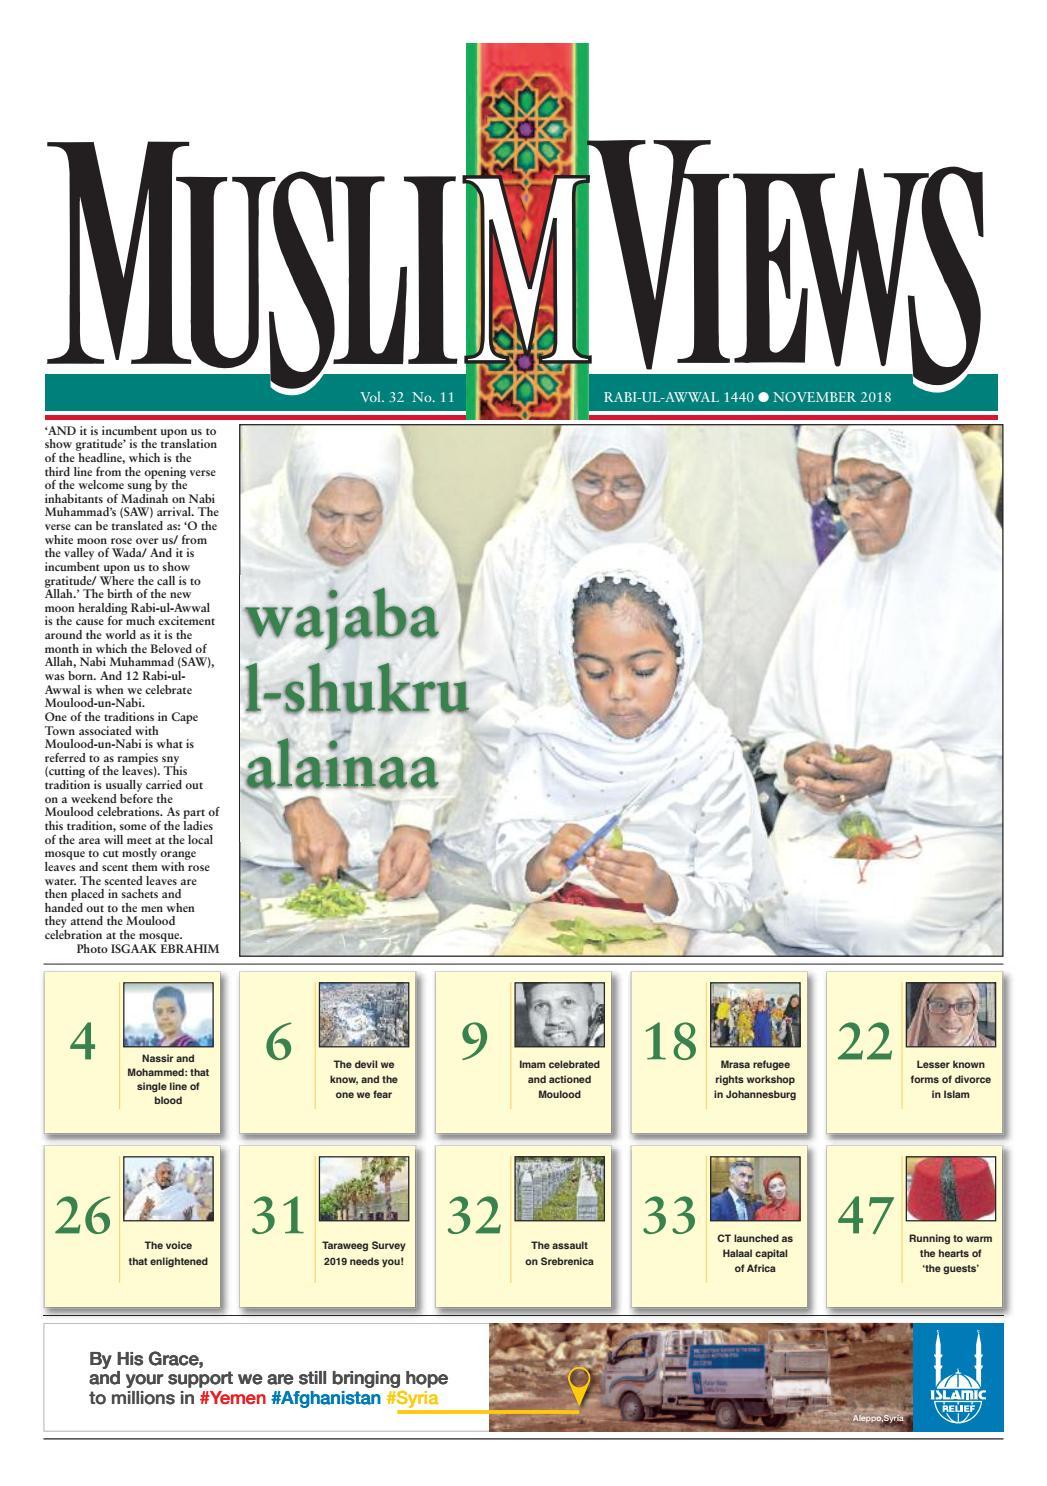 83b6c6ee6e4c5 Muslim Views, November 2018 by Muslim Views - issuu